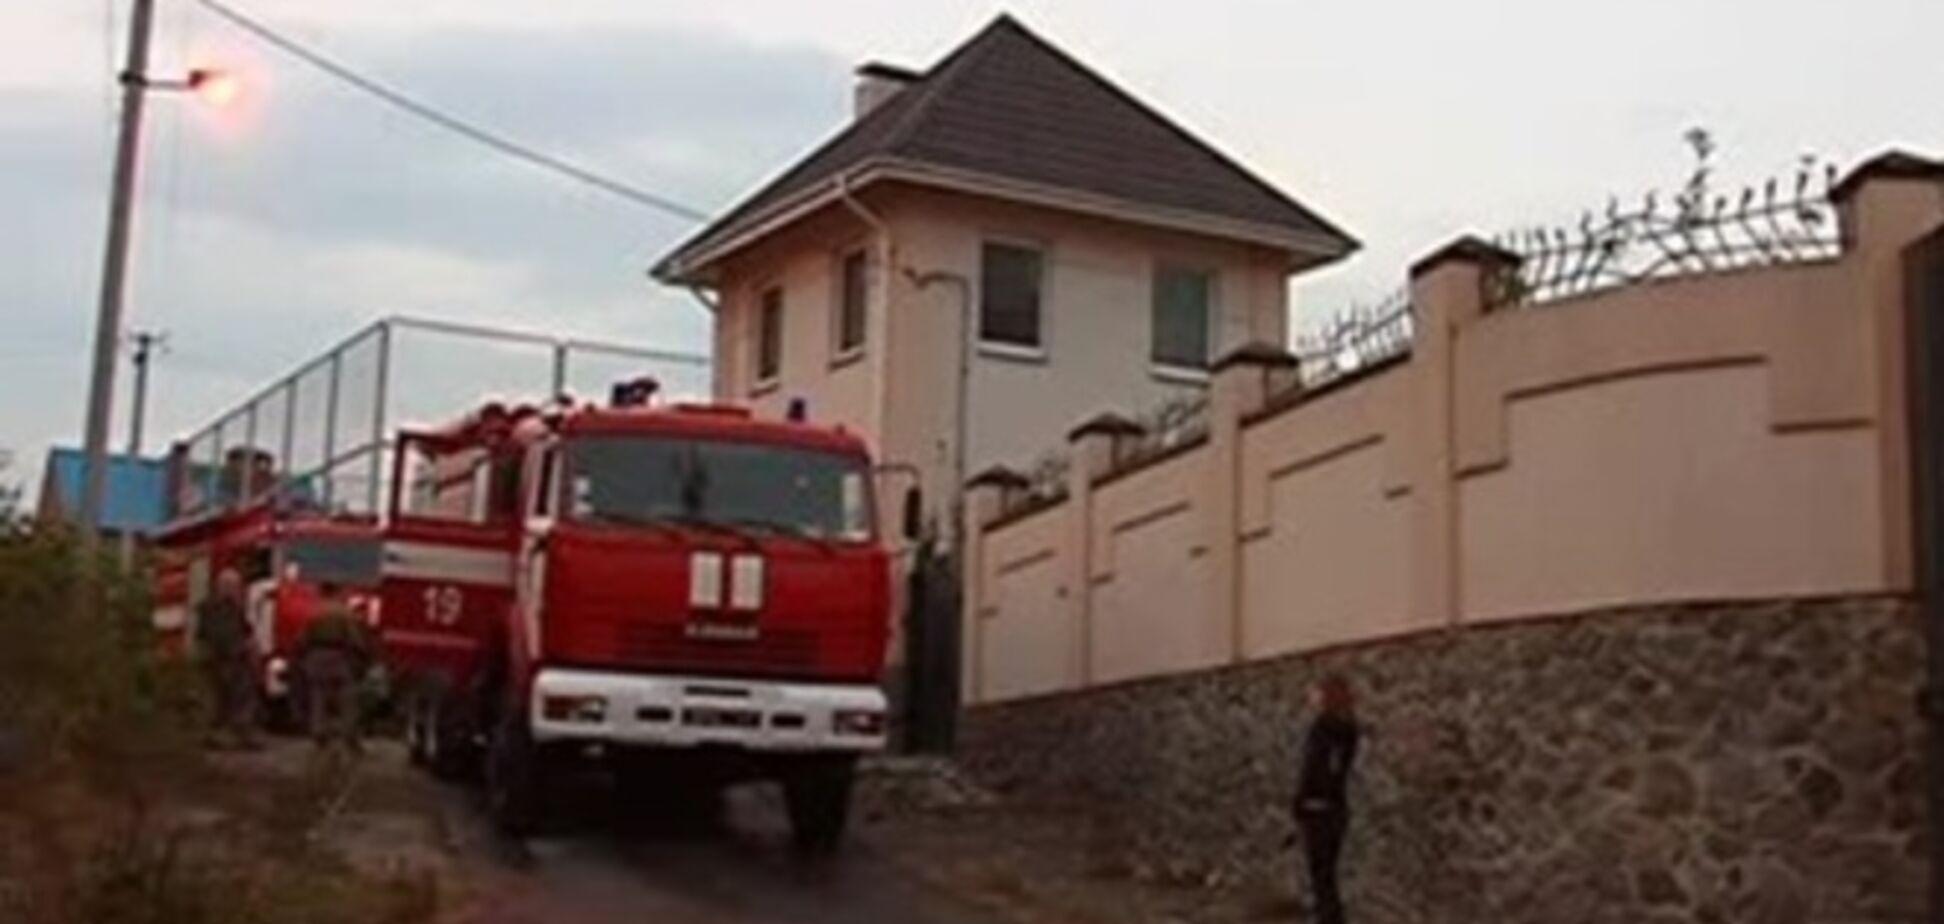 На Днепропетровщине неизвестные забросали 'коктейлями Молотова' особняк соседа Царева